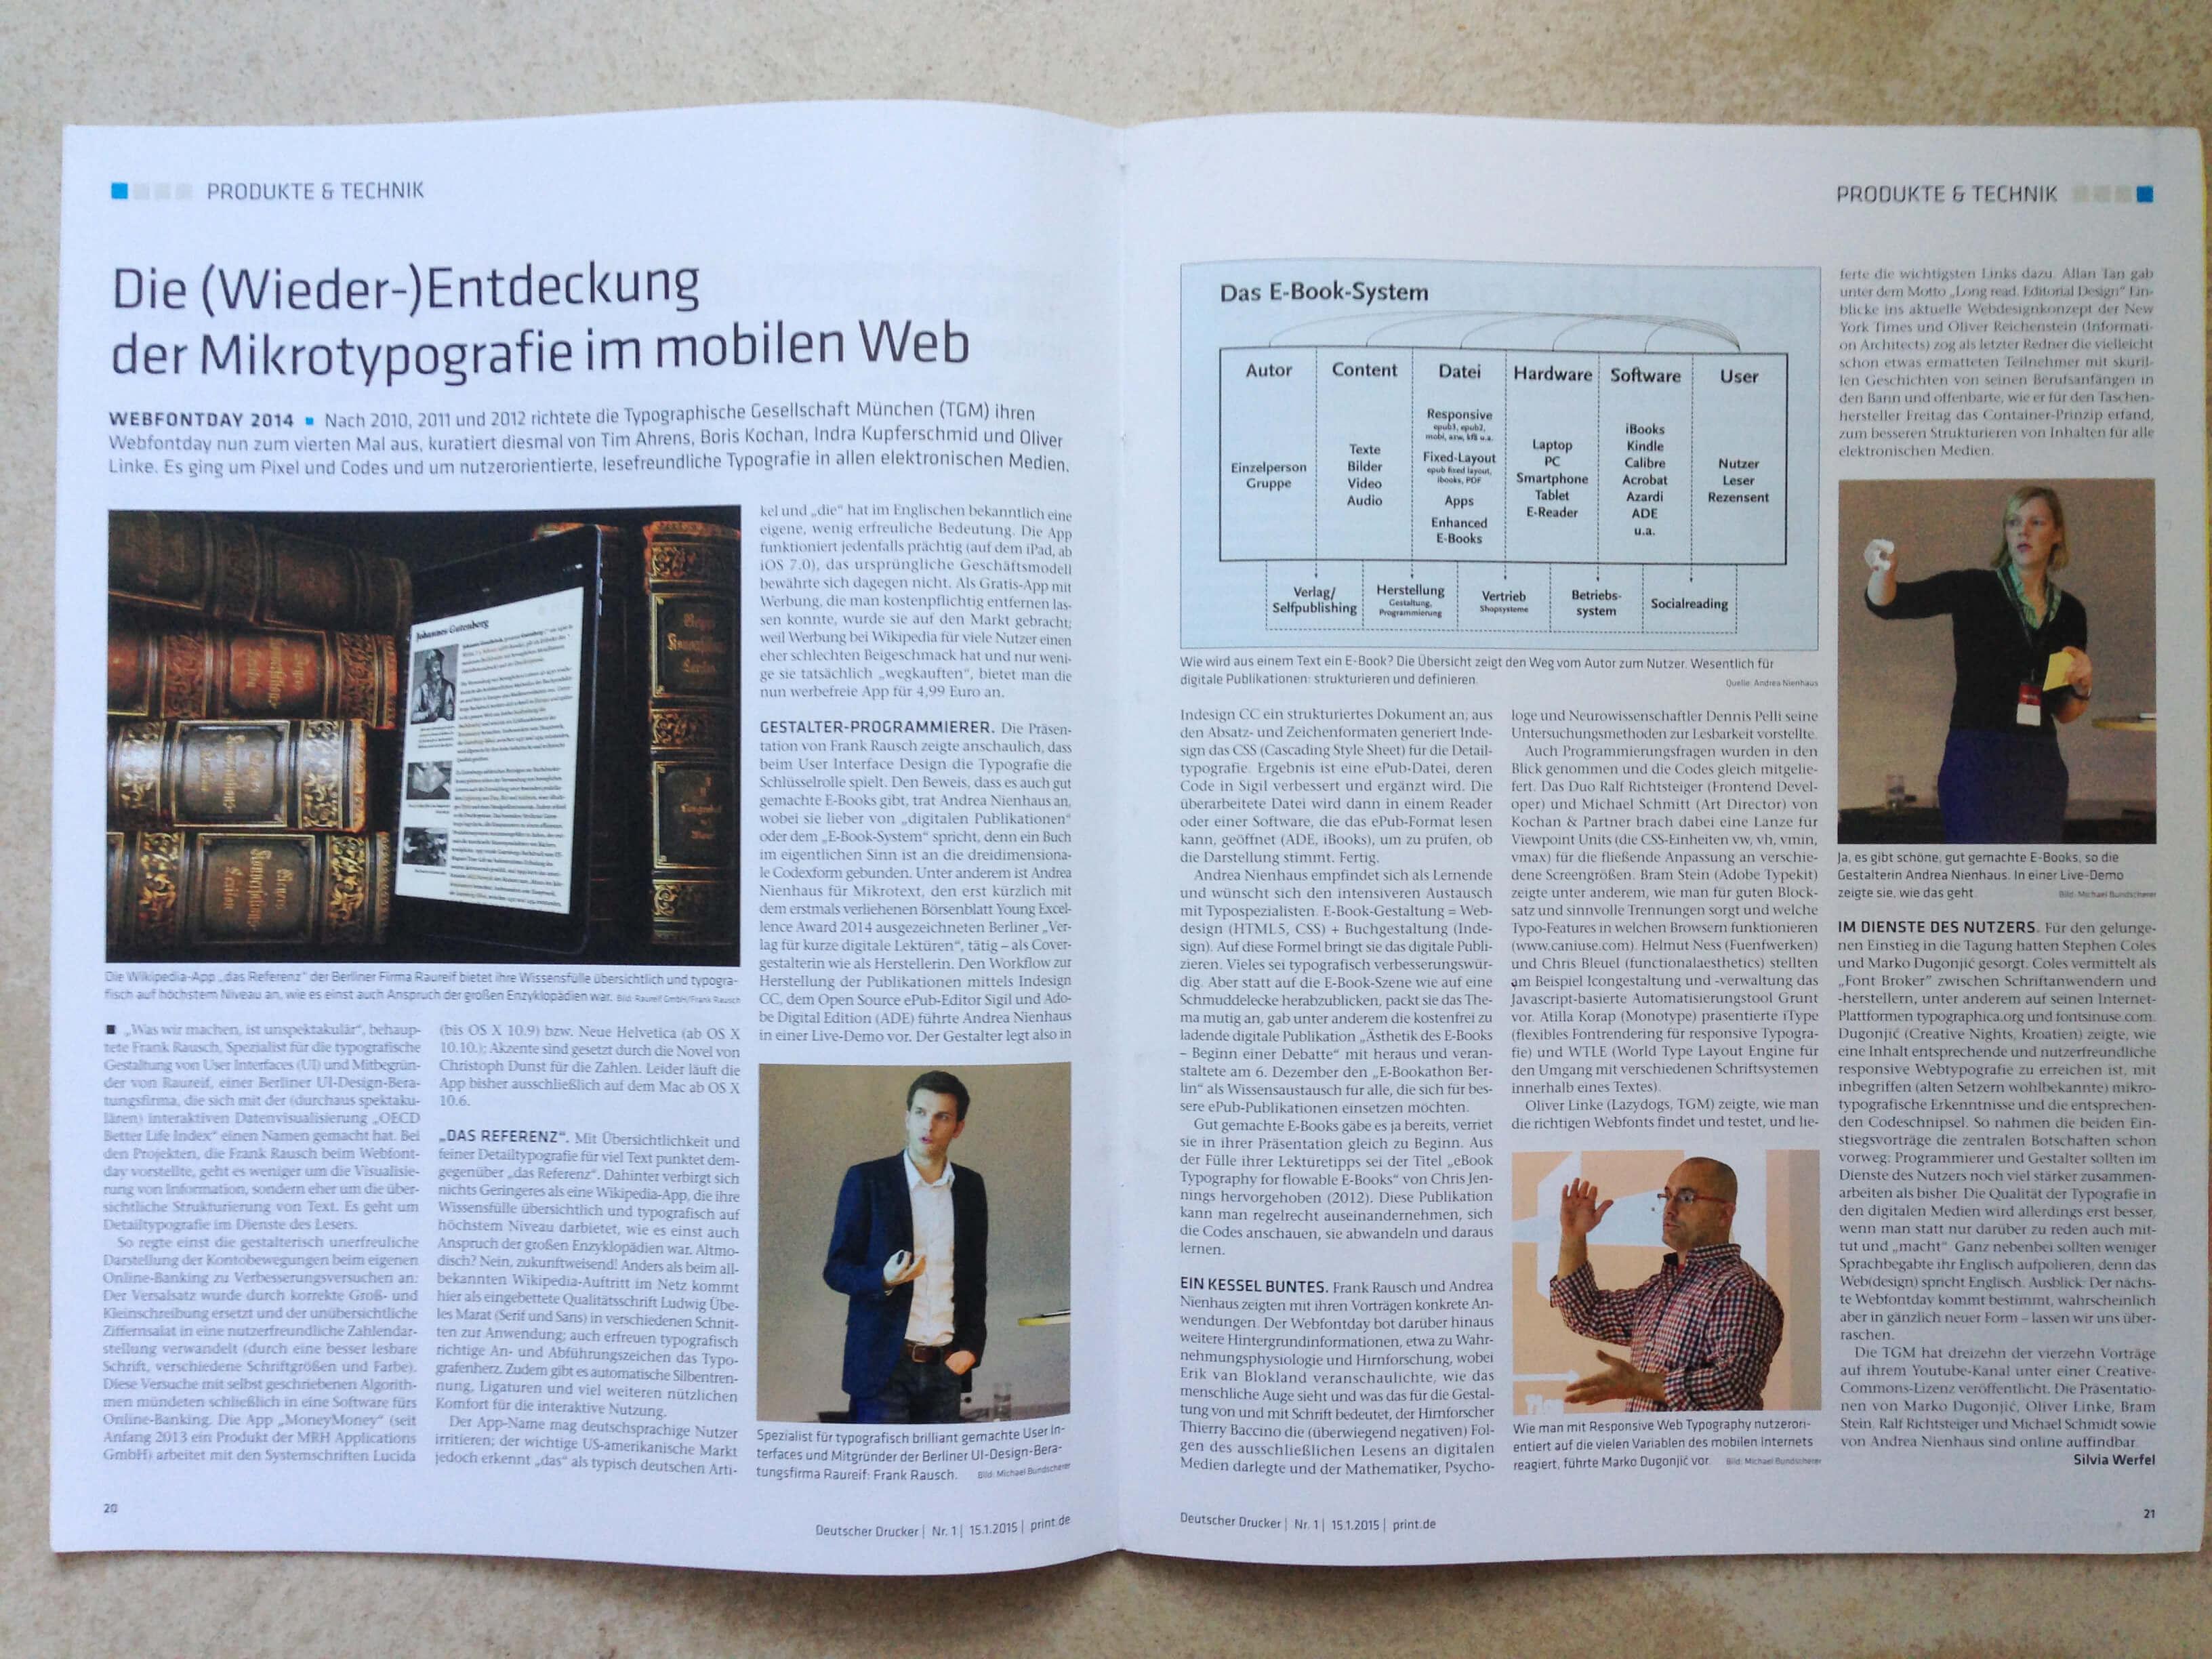 201501-deutscherdrucker